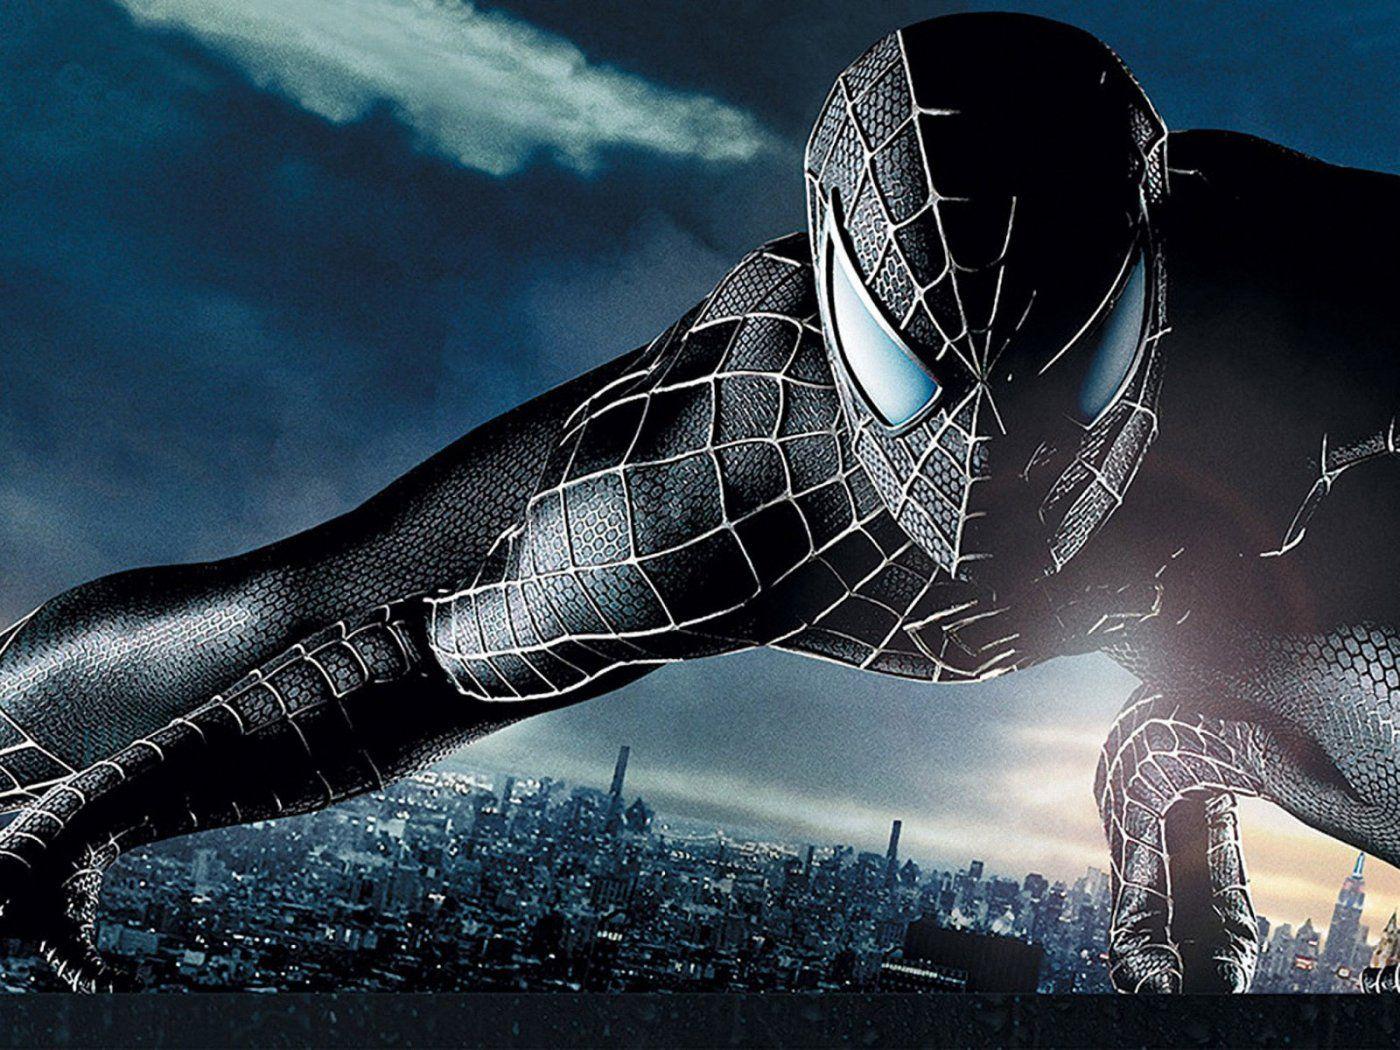 Black Spiderman Wallpapers Black Spiderman Spiderman Symbiote Spiderman